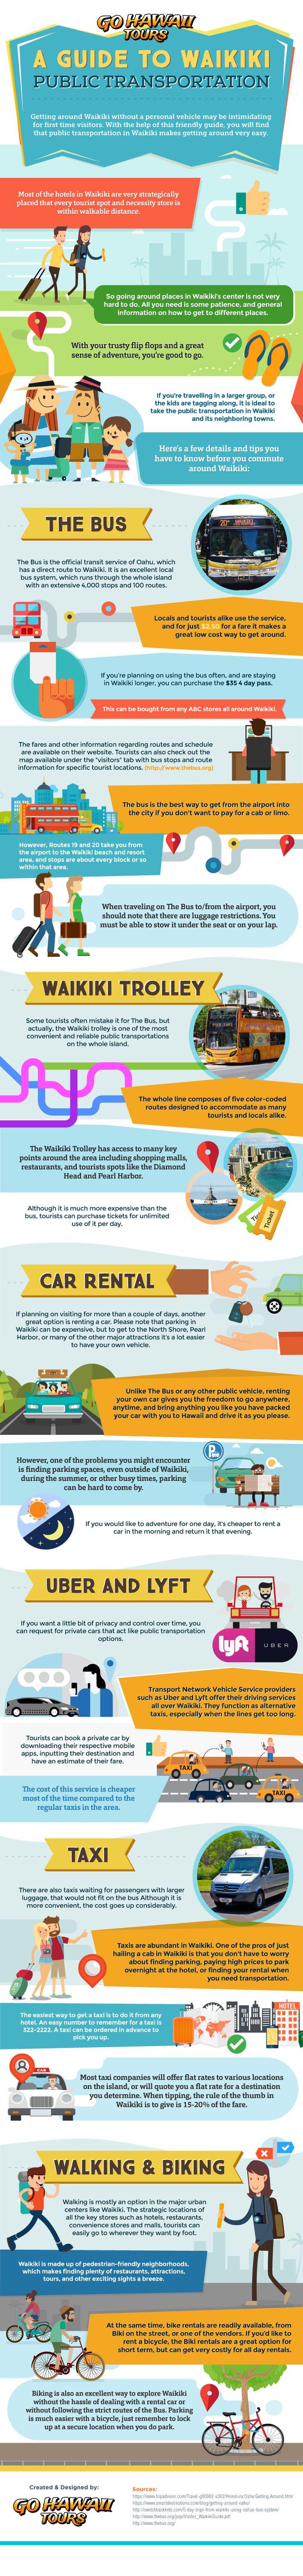 How to Get Around Waikiki Using Public Transport - Infographic